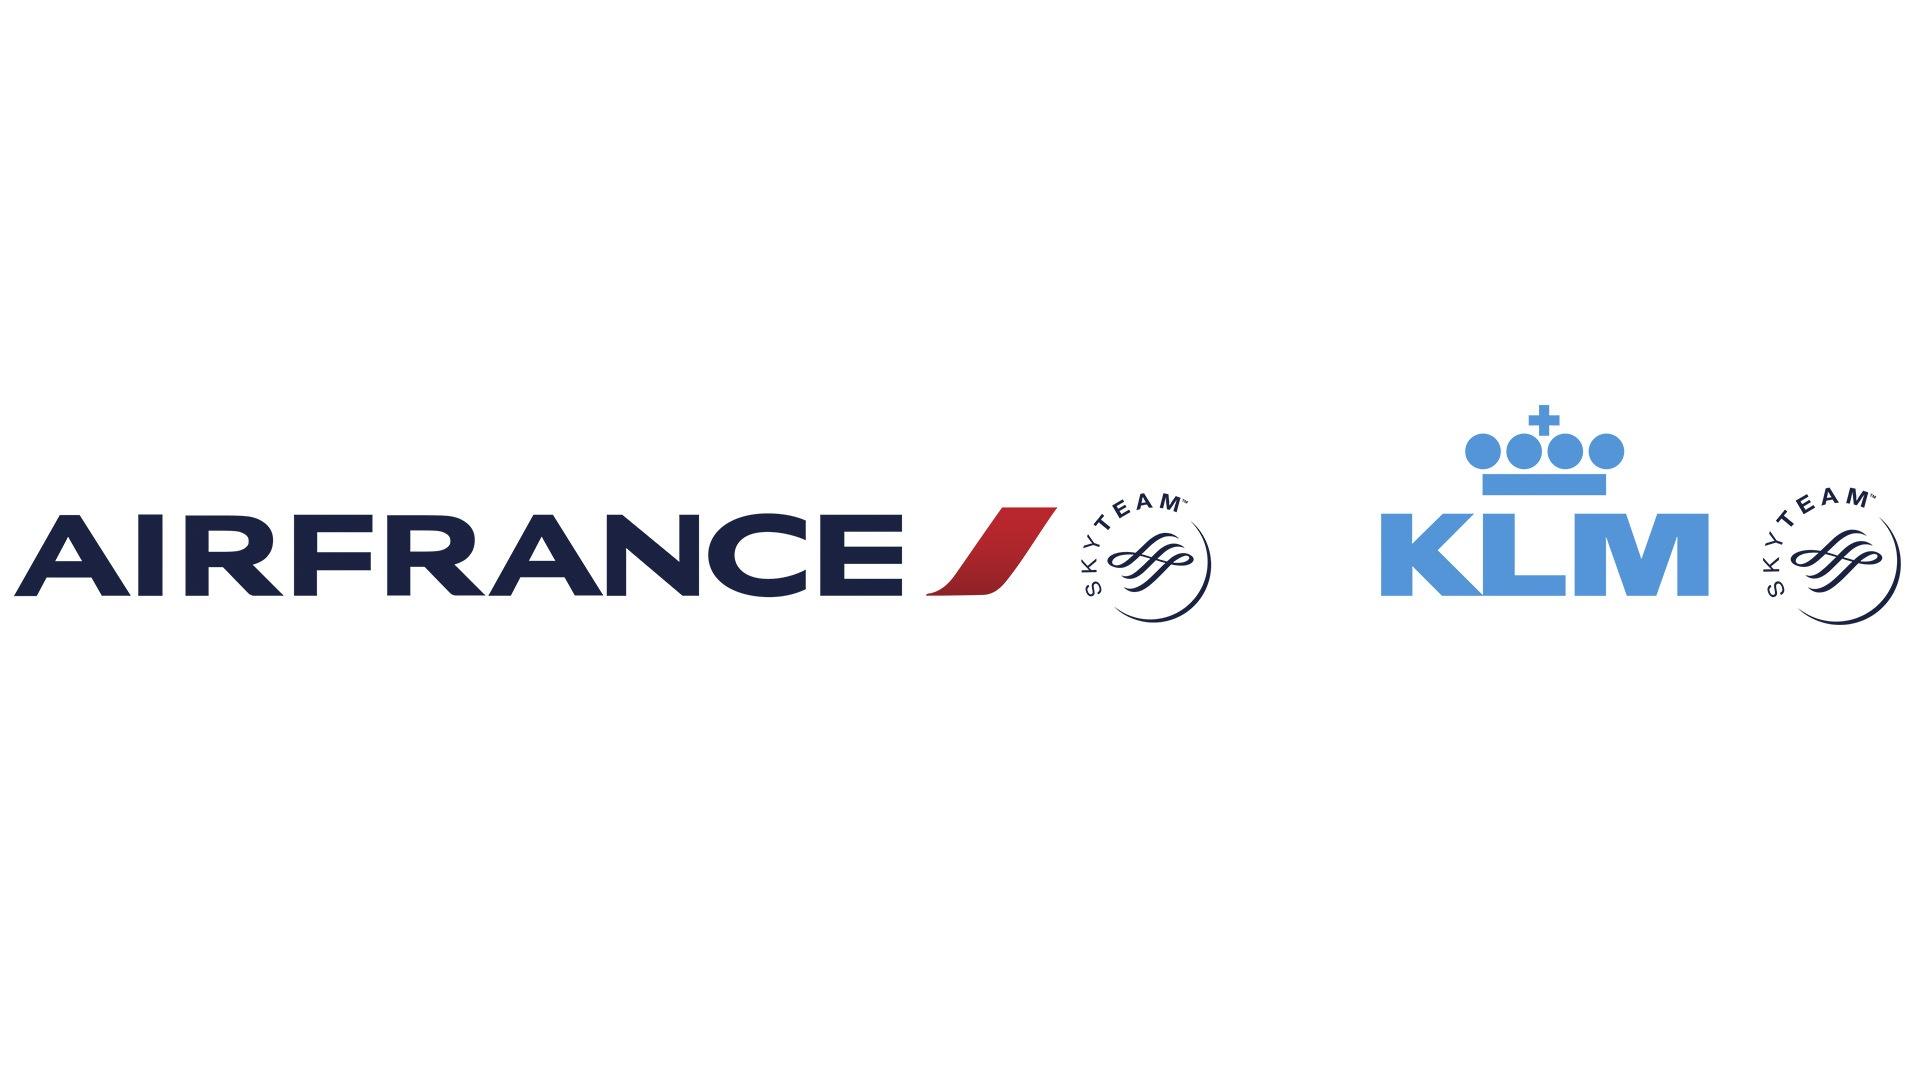 Des bleus un peu partout ... - Page 3 R.0882b1dd10b654dd65262add5b4a2de8?rik=PZc87XSoXs%2f34A&riu=http%3a%2f%2ftous-logos.com%2fwp-content%2fuploads%2f2018%2f07%2fair-france-klm-logo